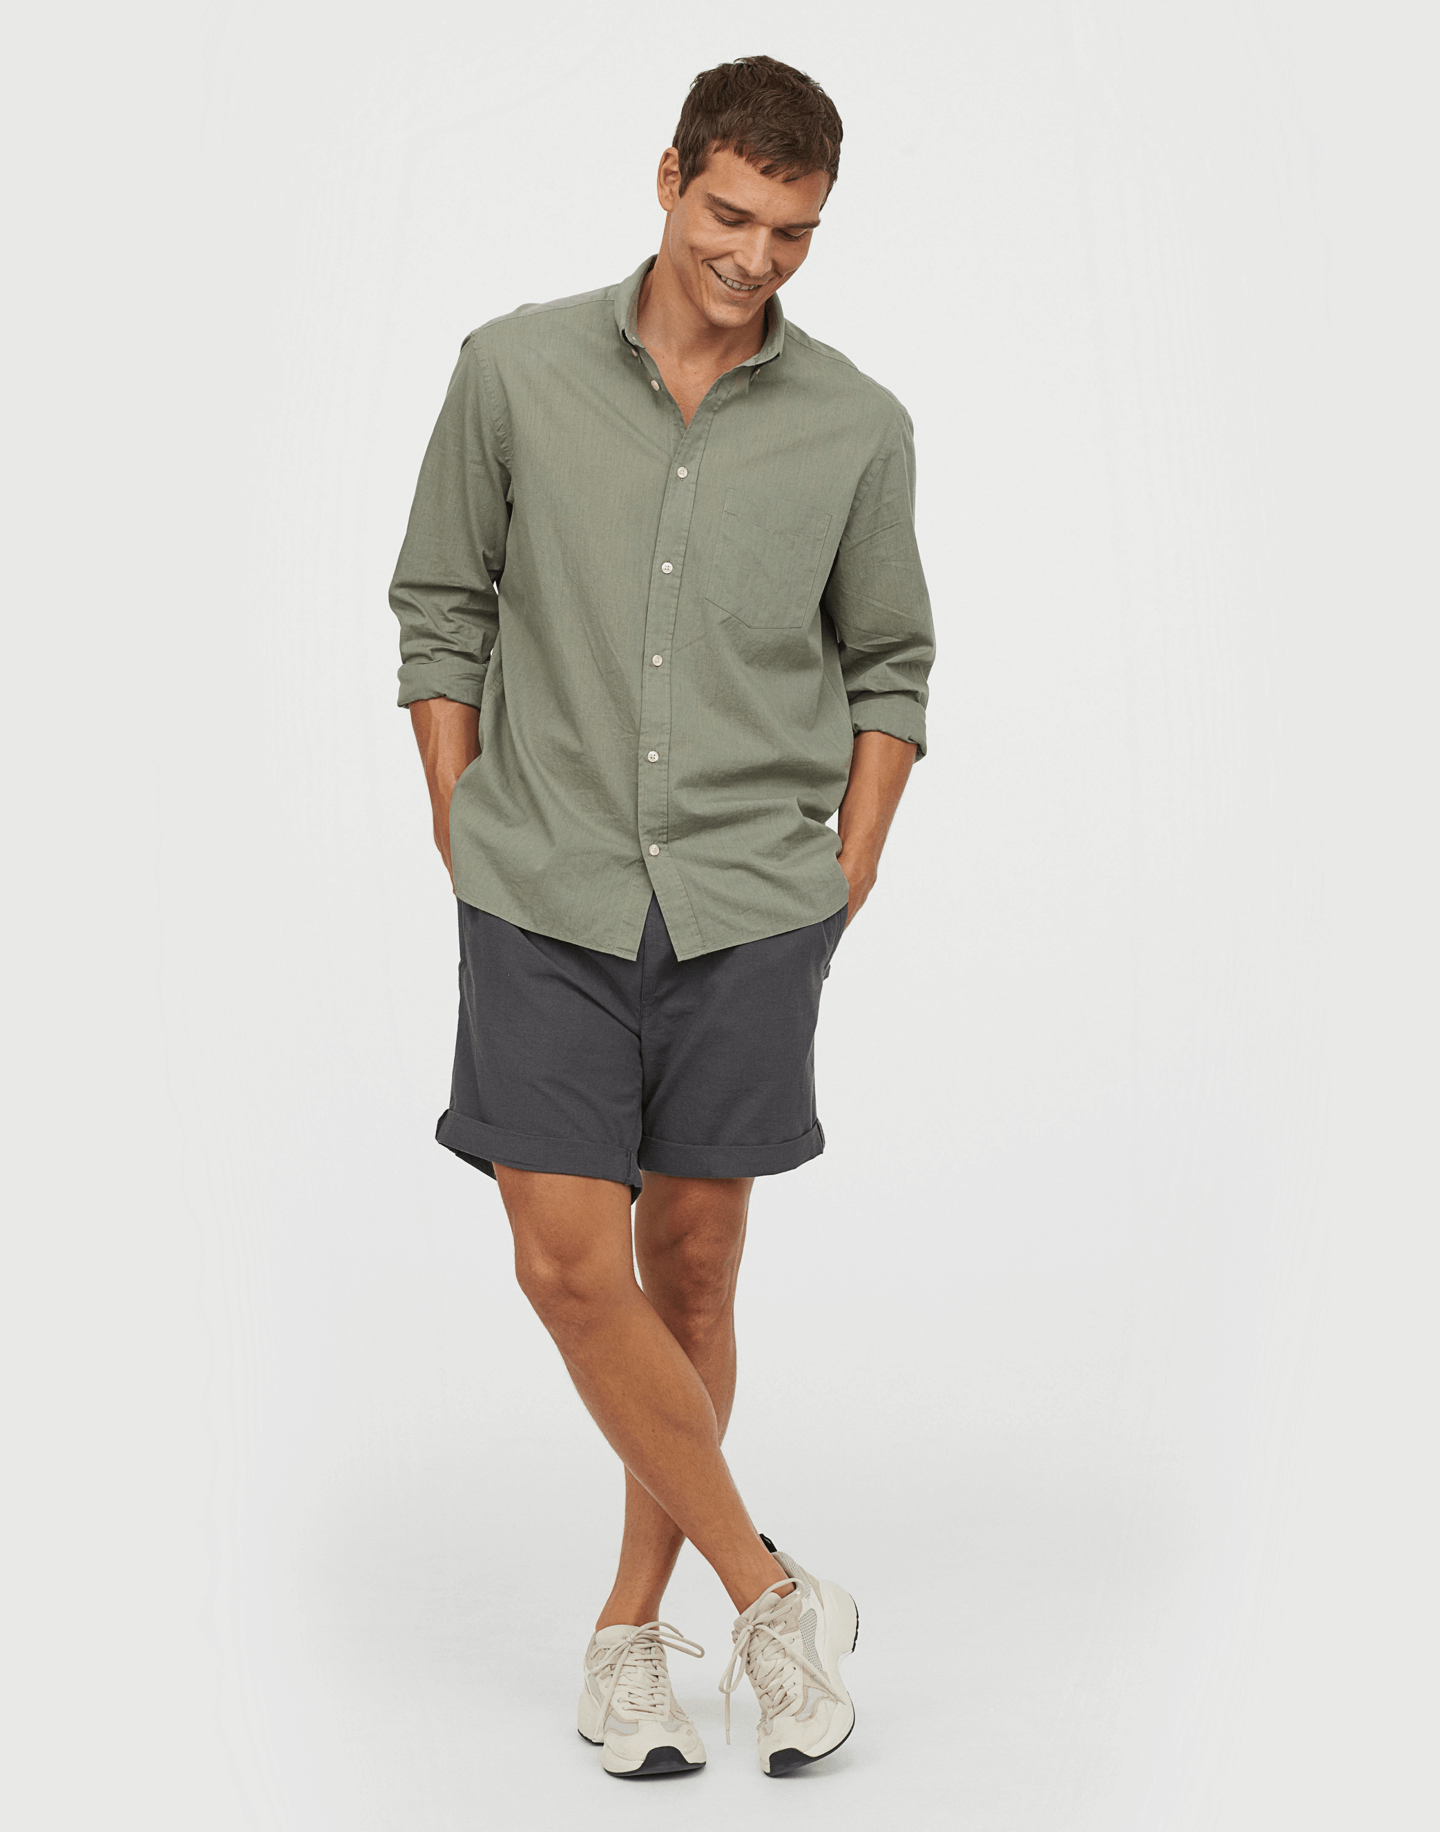 Men's WFH outfit inspiration